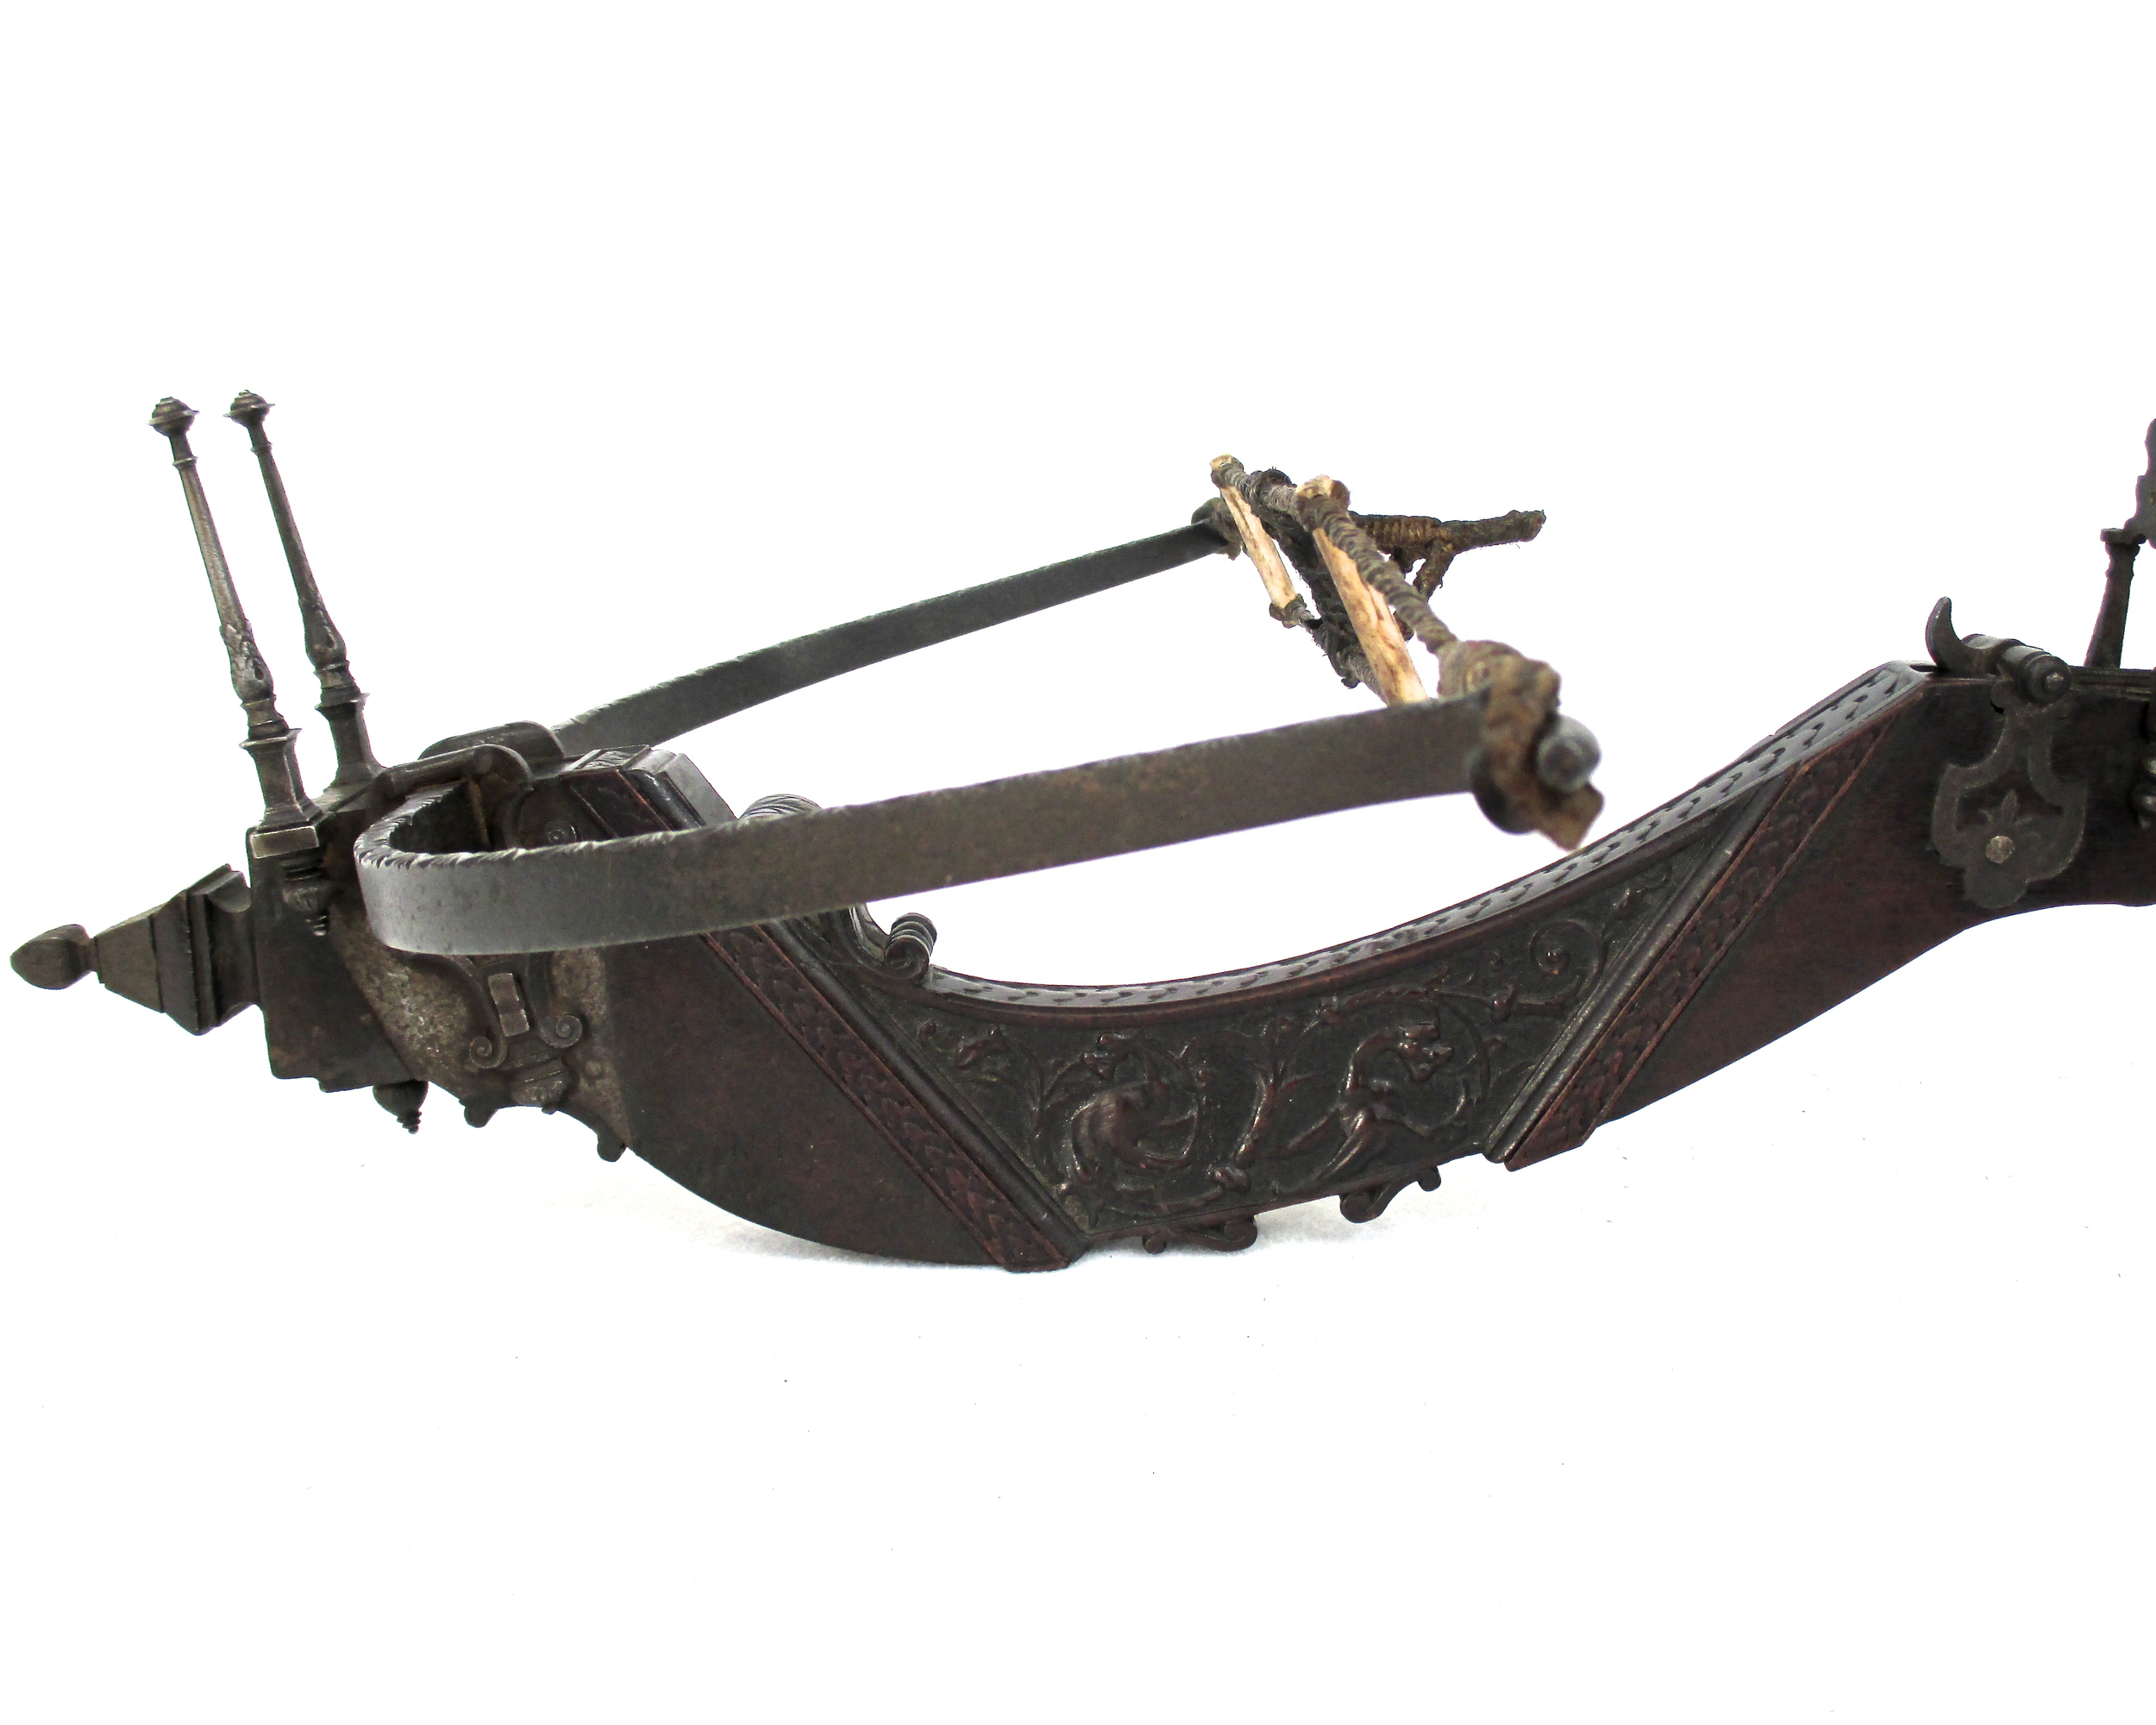 italian-stonebow-crossbow-tuscany-16thc-gary-friedland-arms-armor-weapons6.jpg